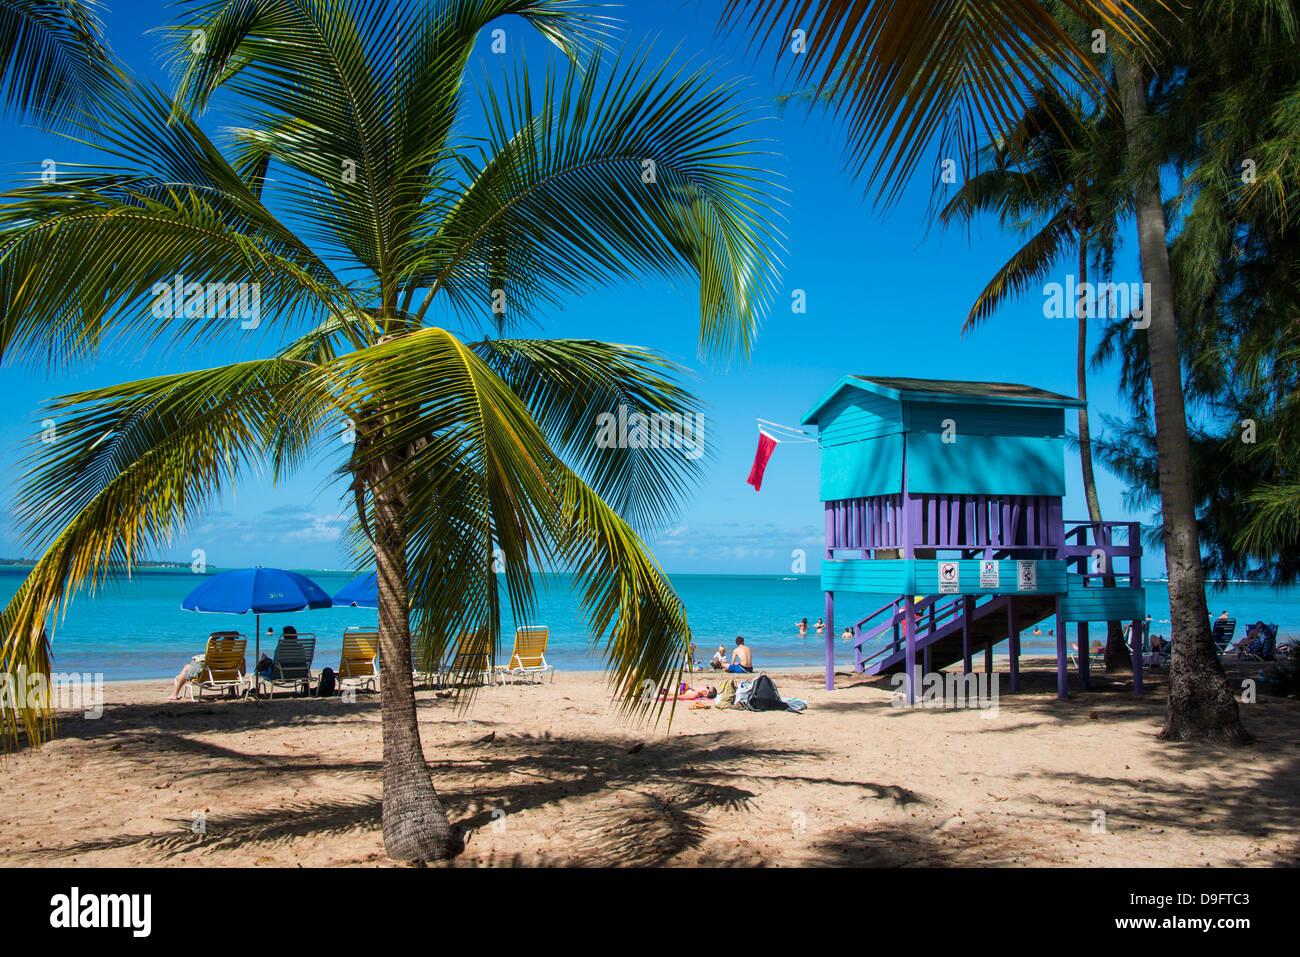 Luquillo Beach, Puerto Rico, Karibik, Caribbean Stockbild